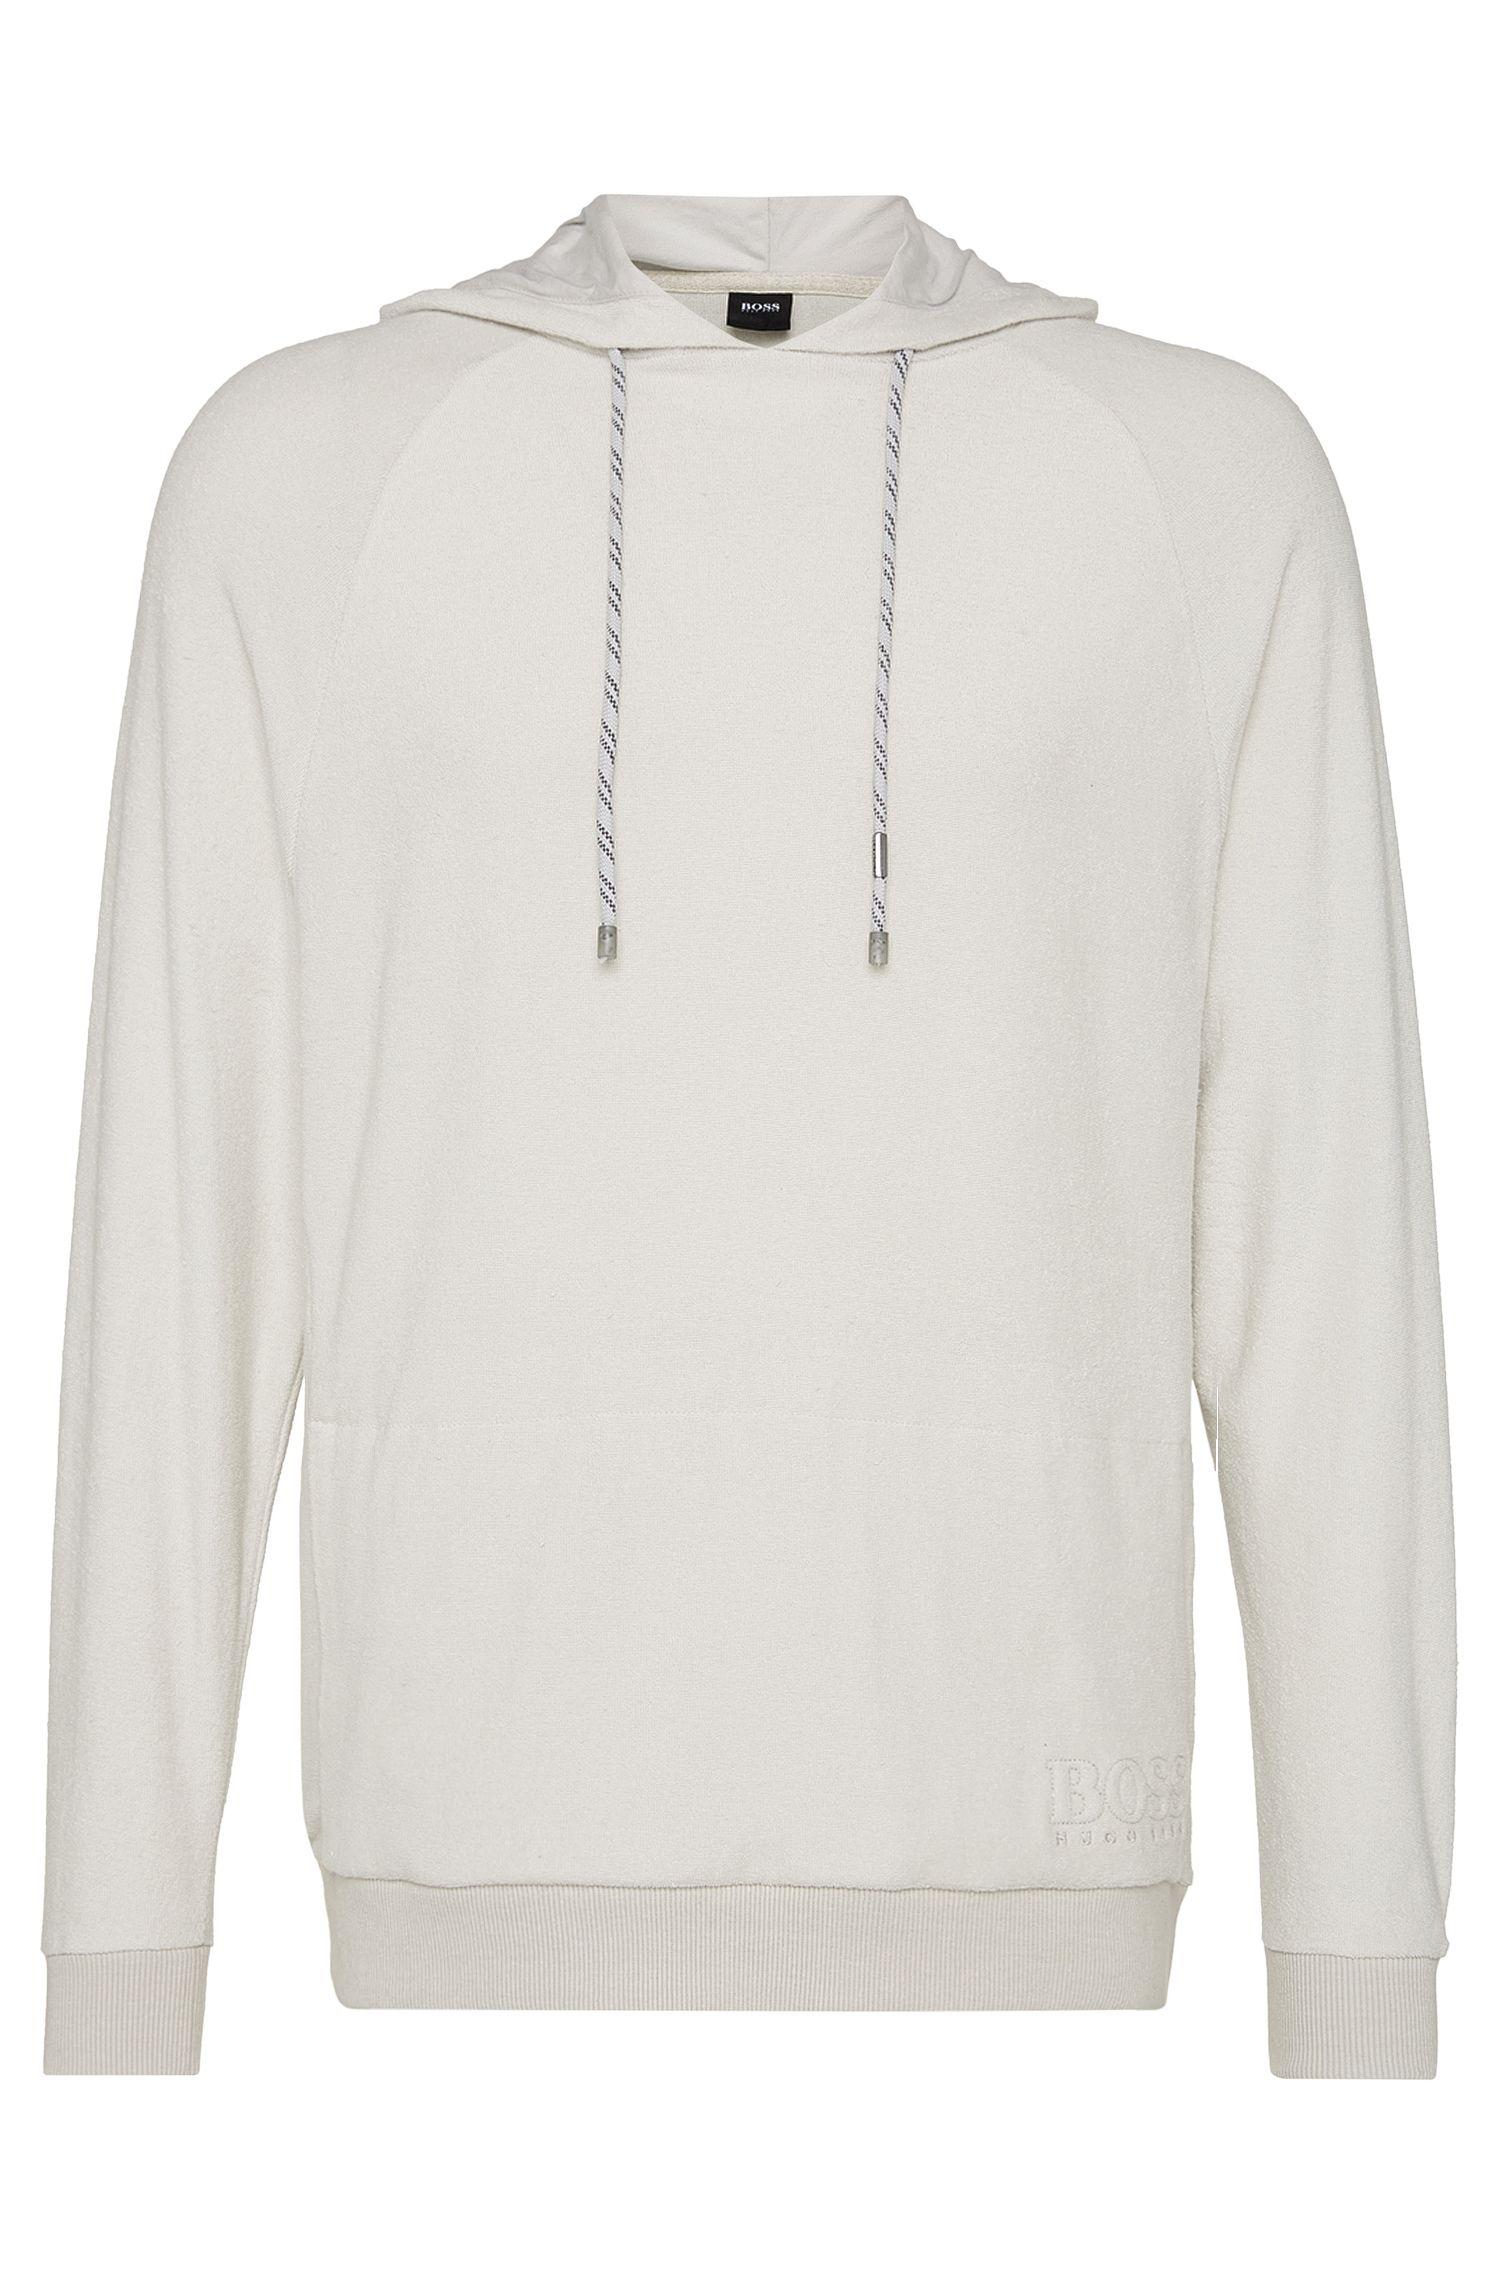 Sweatshirt aus Baumwolle: 'Shirt Hooded LS'